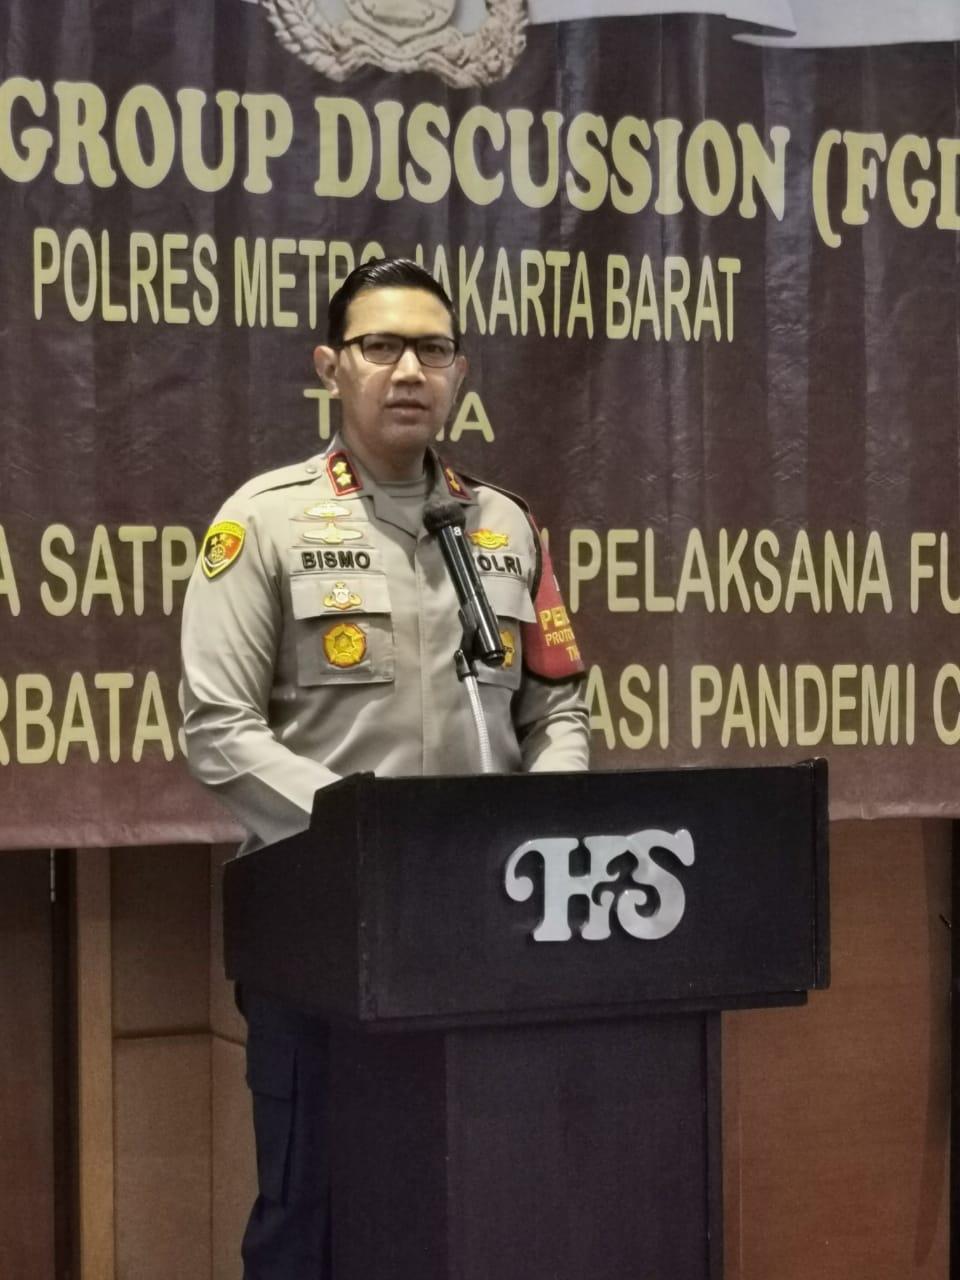 Polres Jakarta Barat, Fungsi Satuan Pengaman Menjadi Garda Terdepan